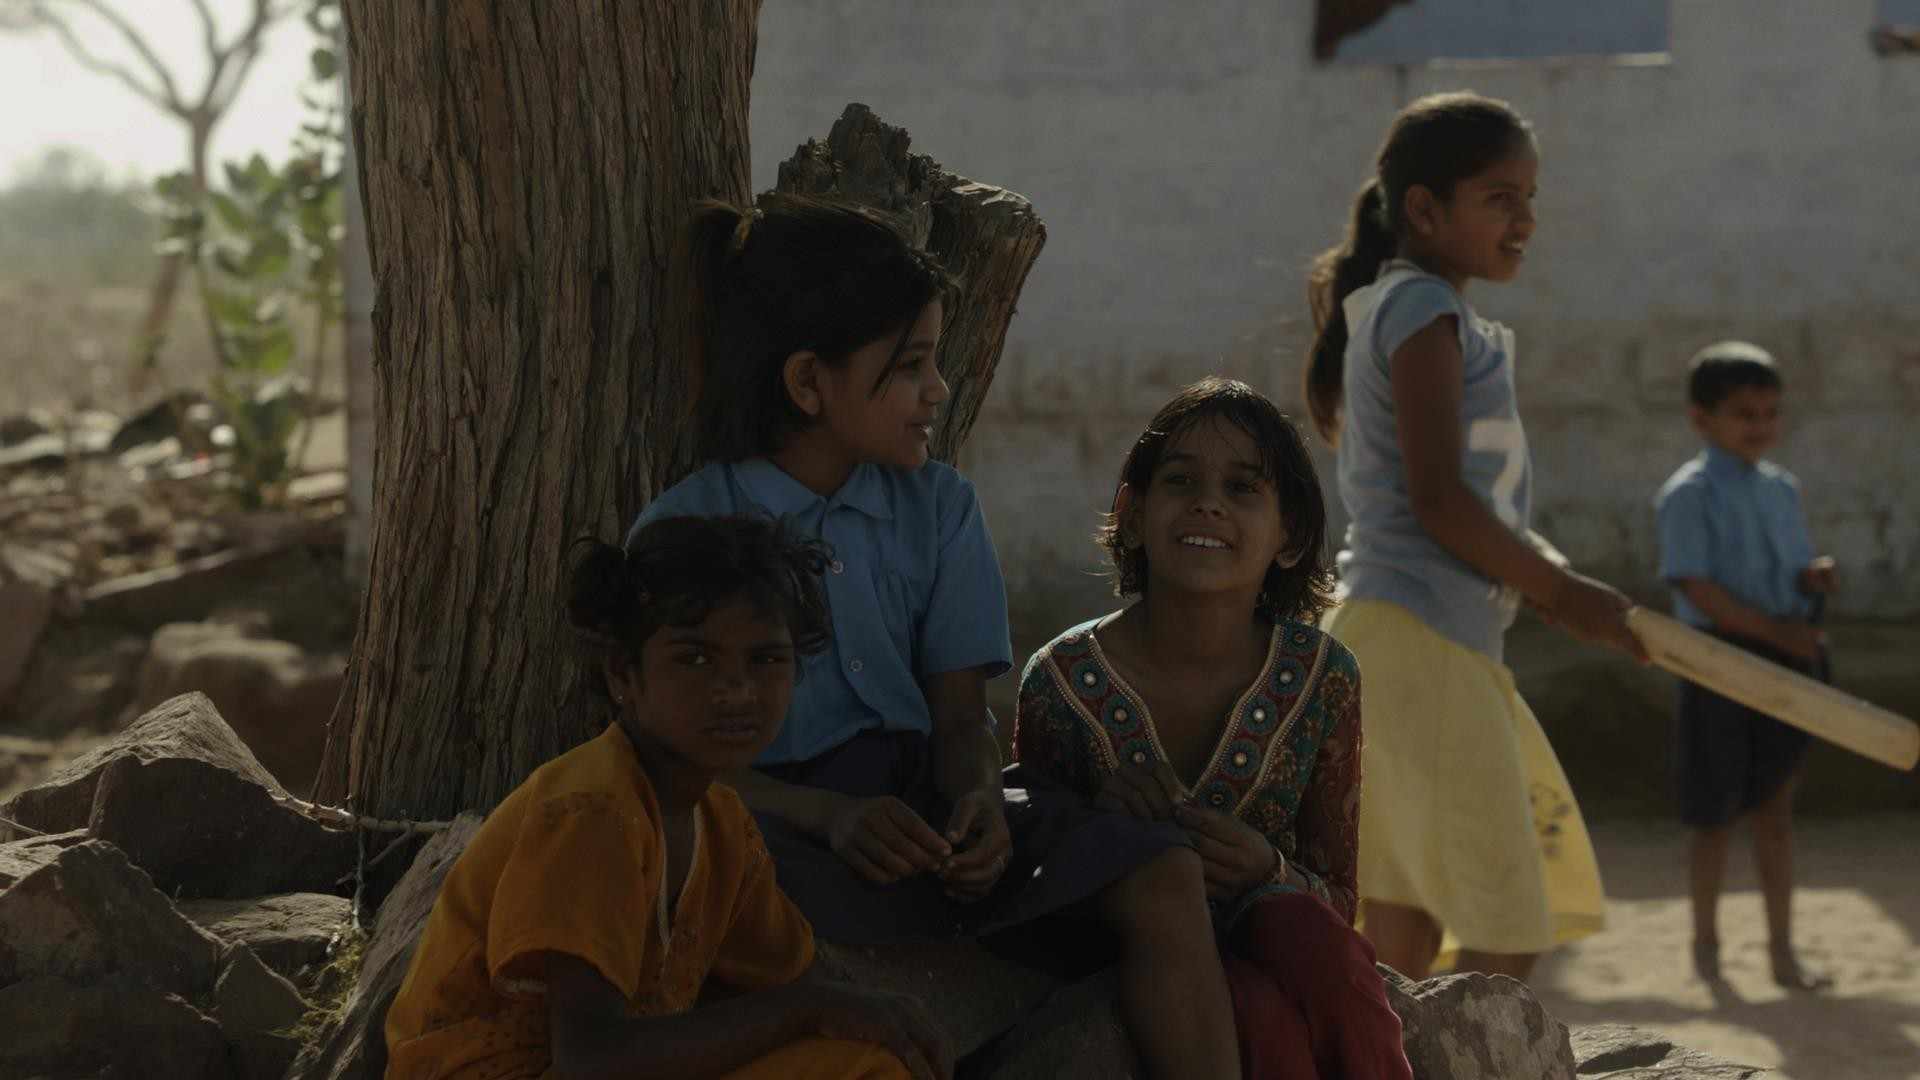 кадры из фильма Красавица из трущоб